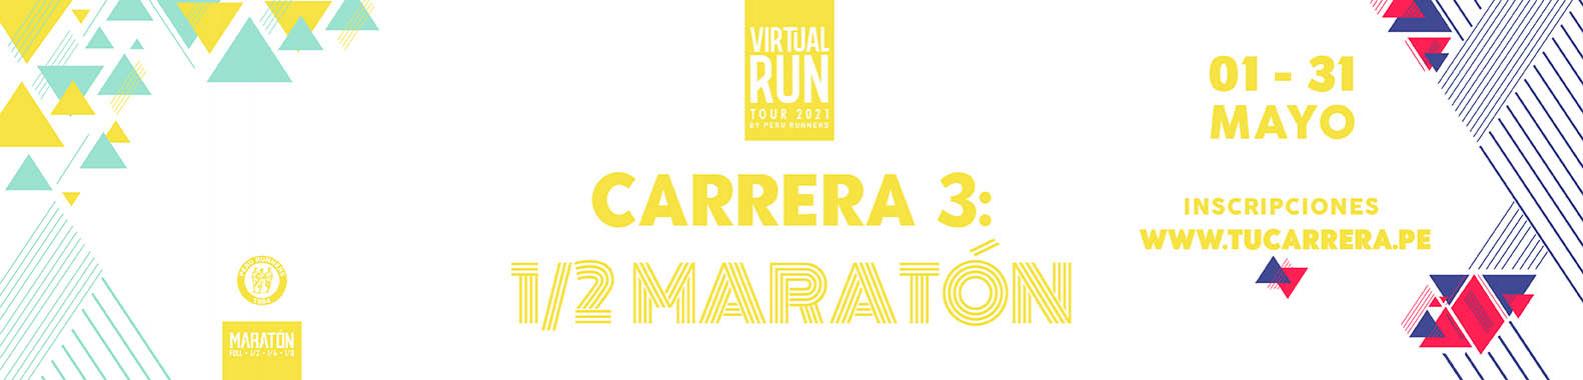 111 media maraton